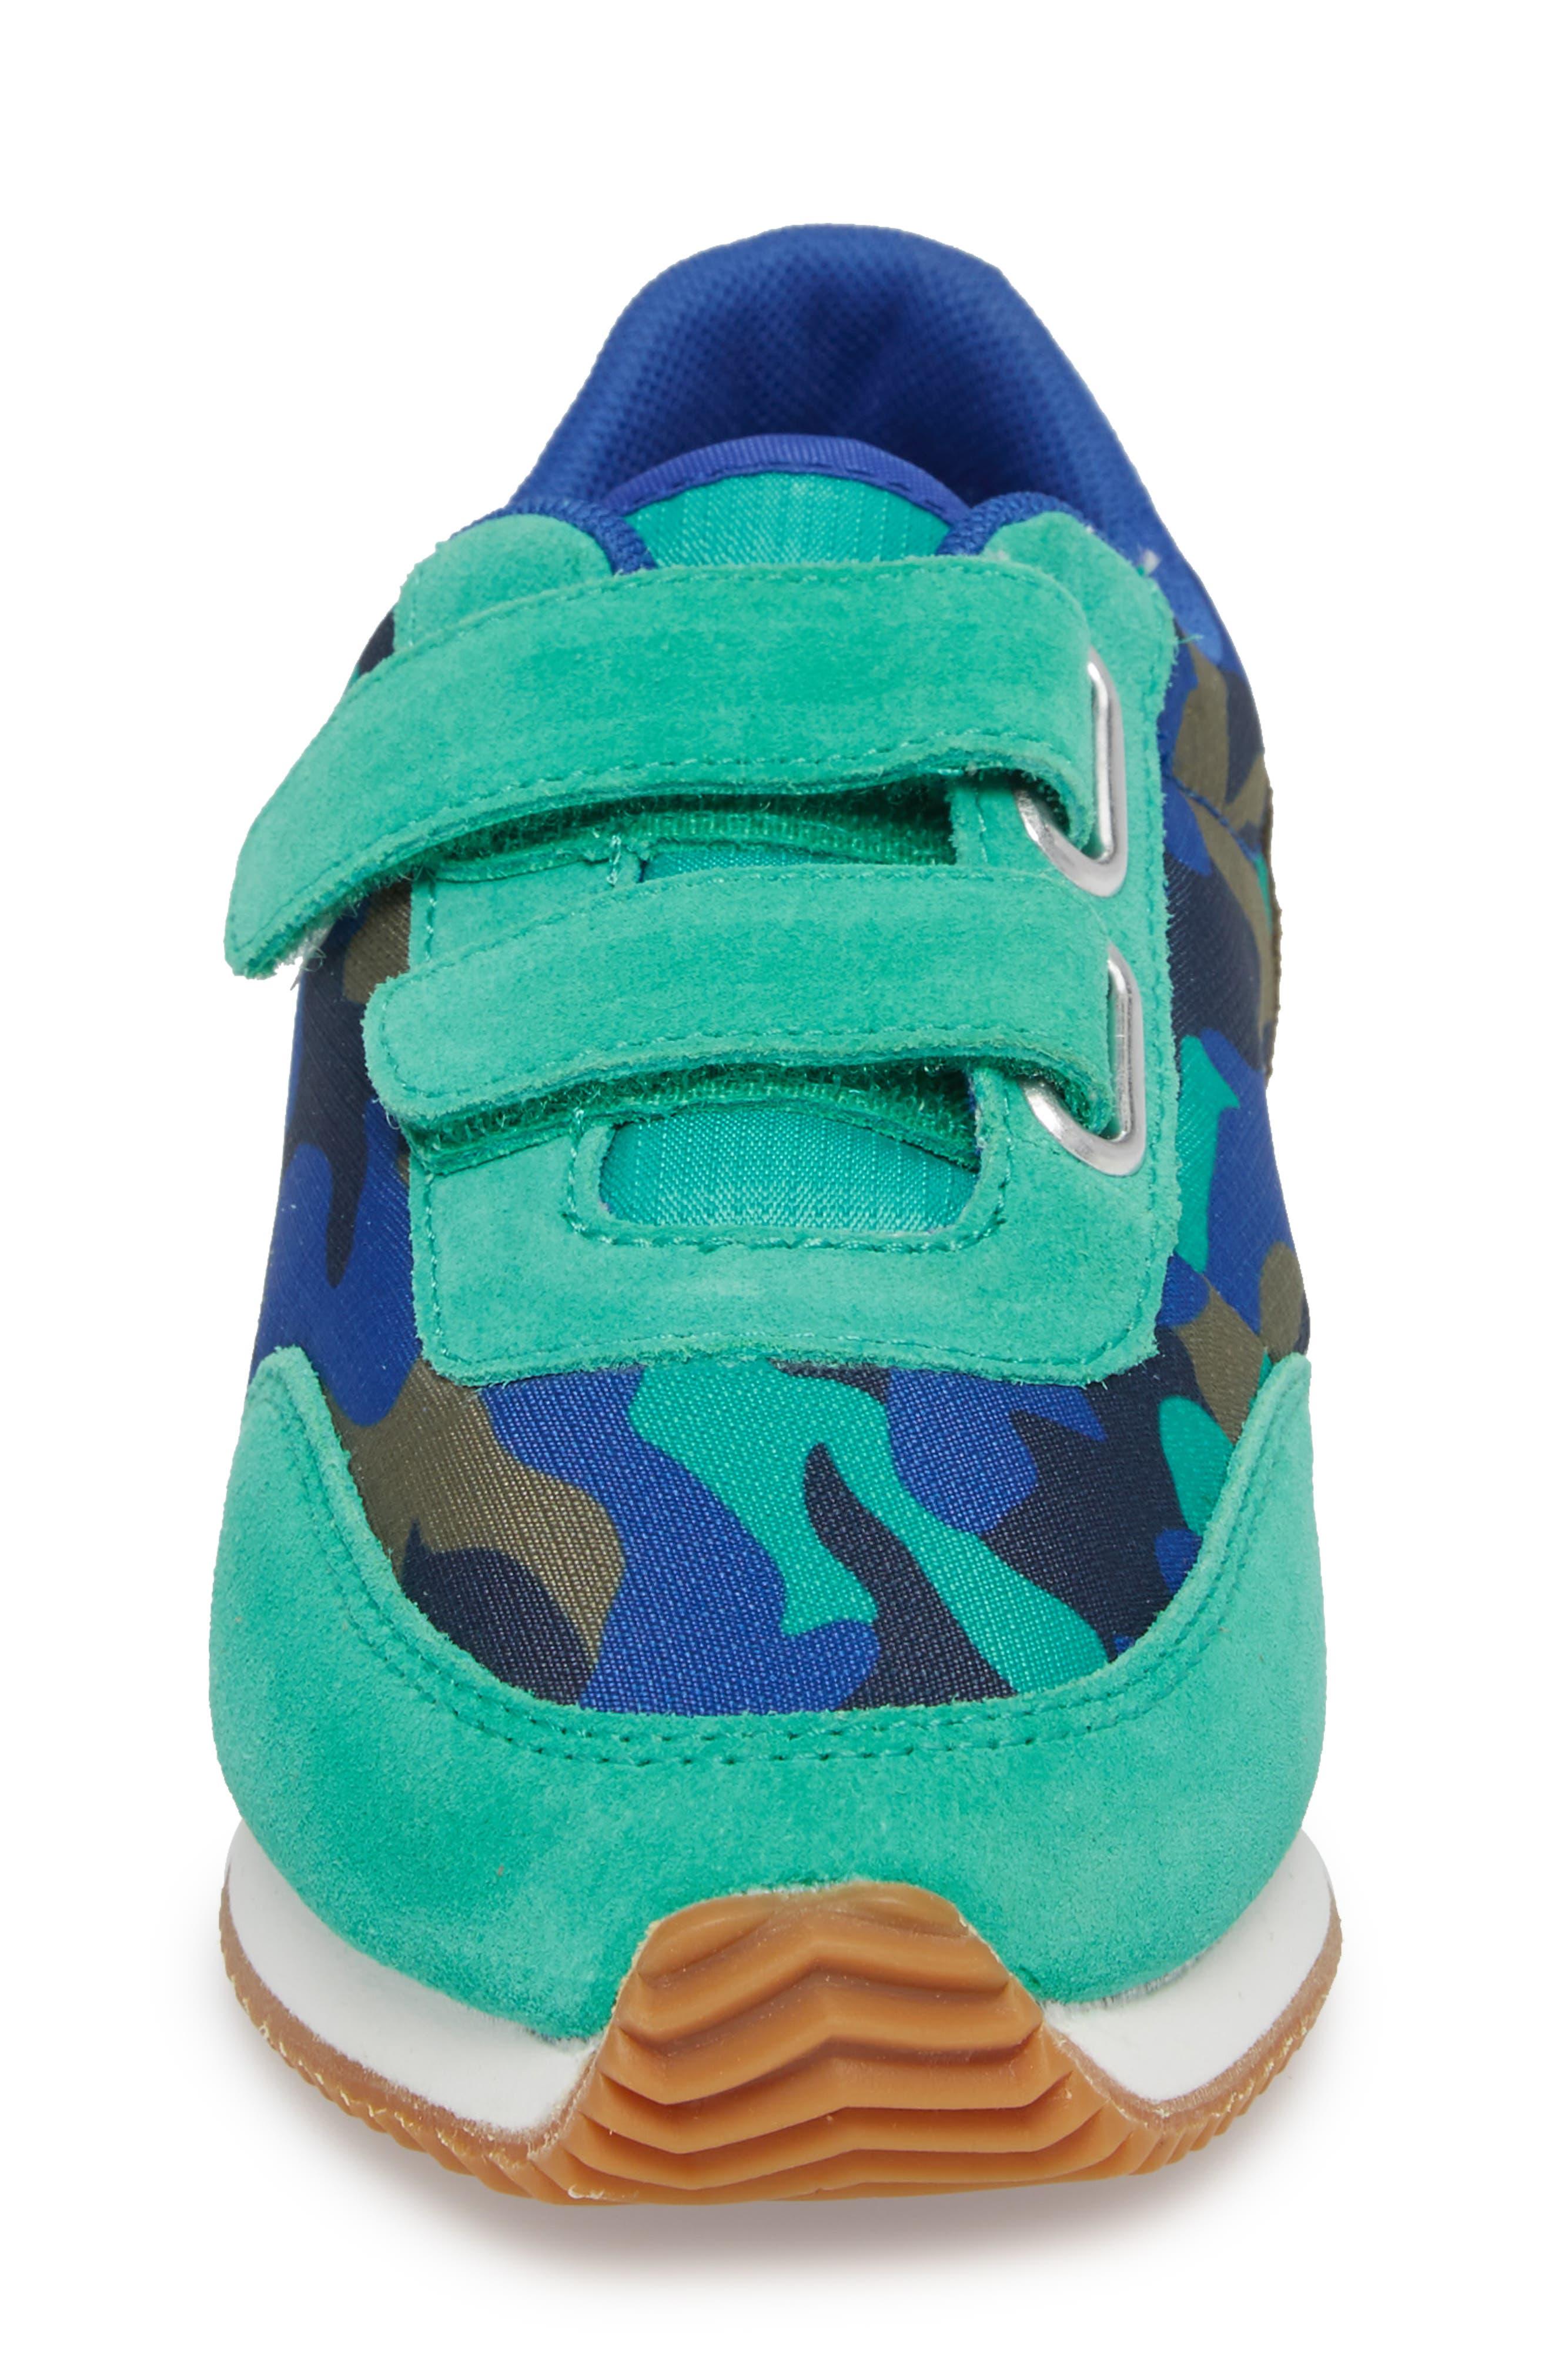 Print Sneakers,                             Alternate thumbnail 4, color,                             315